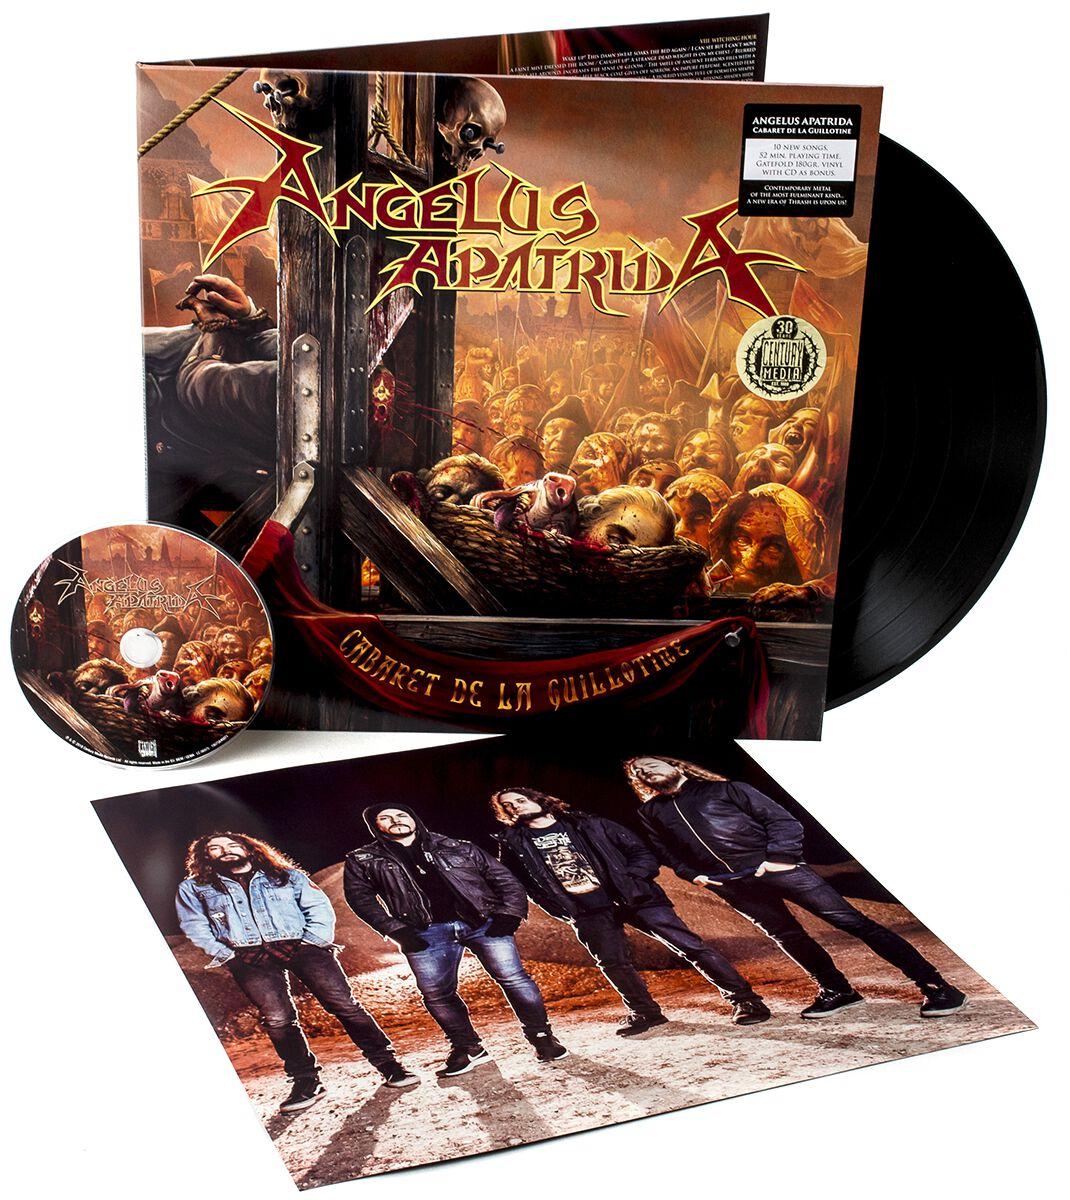 Image of Angelus Apatrida Cabaret de la guillotine LP & CD Standard